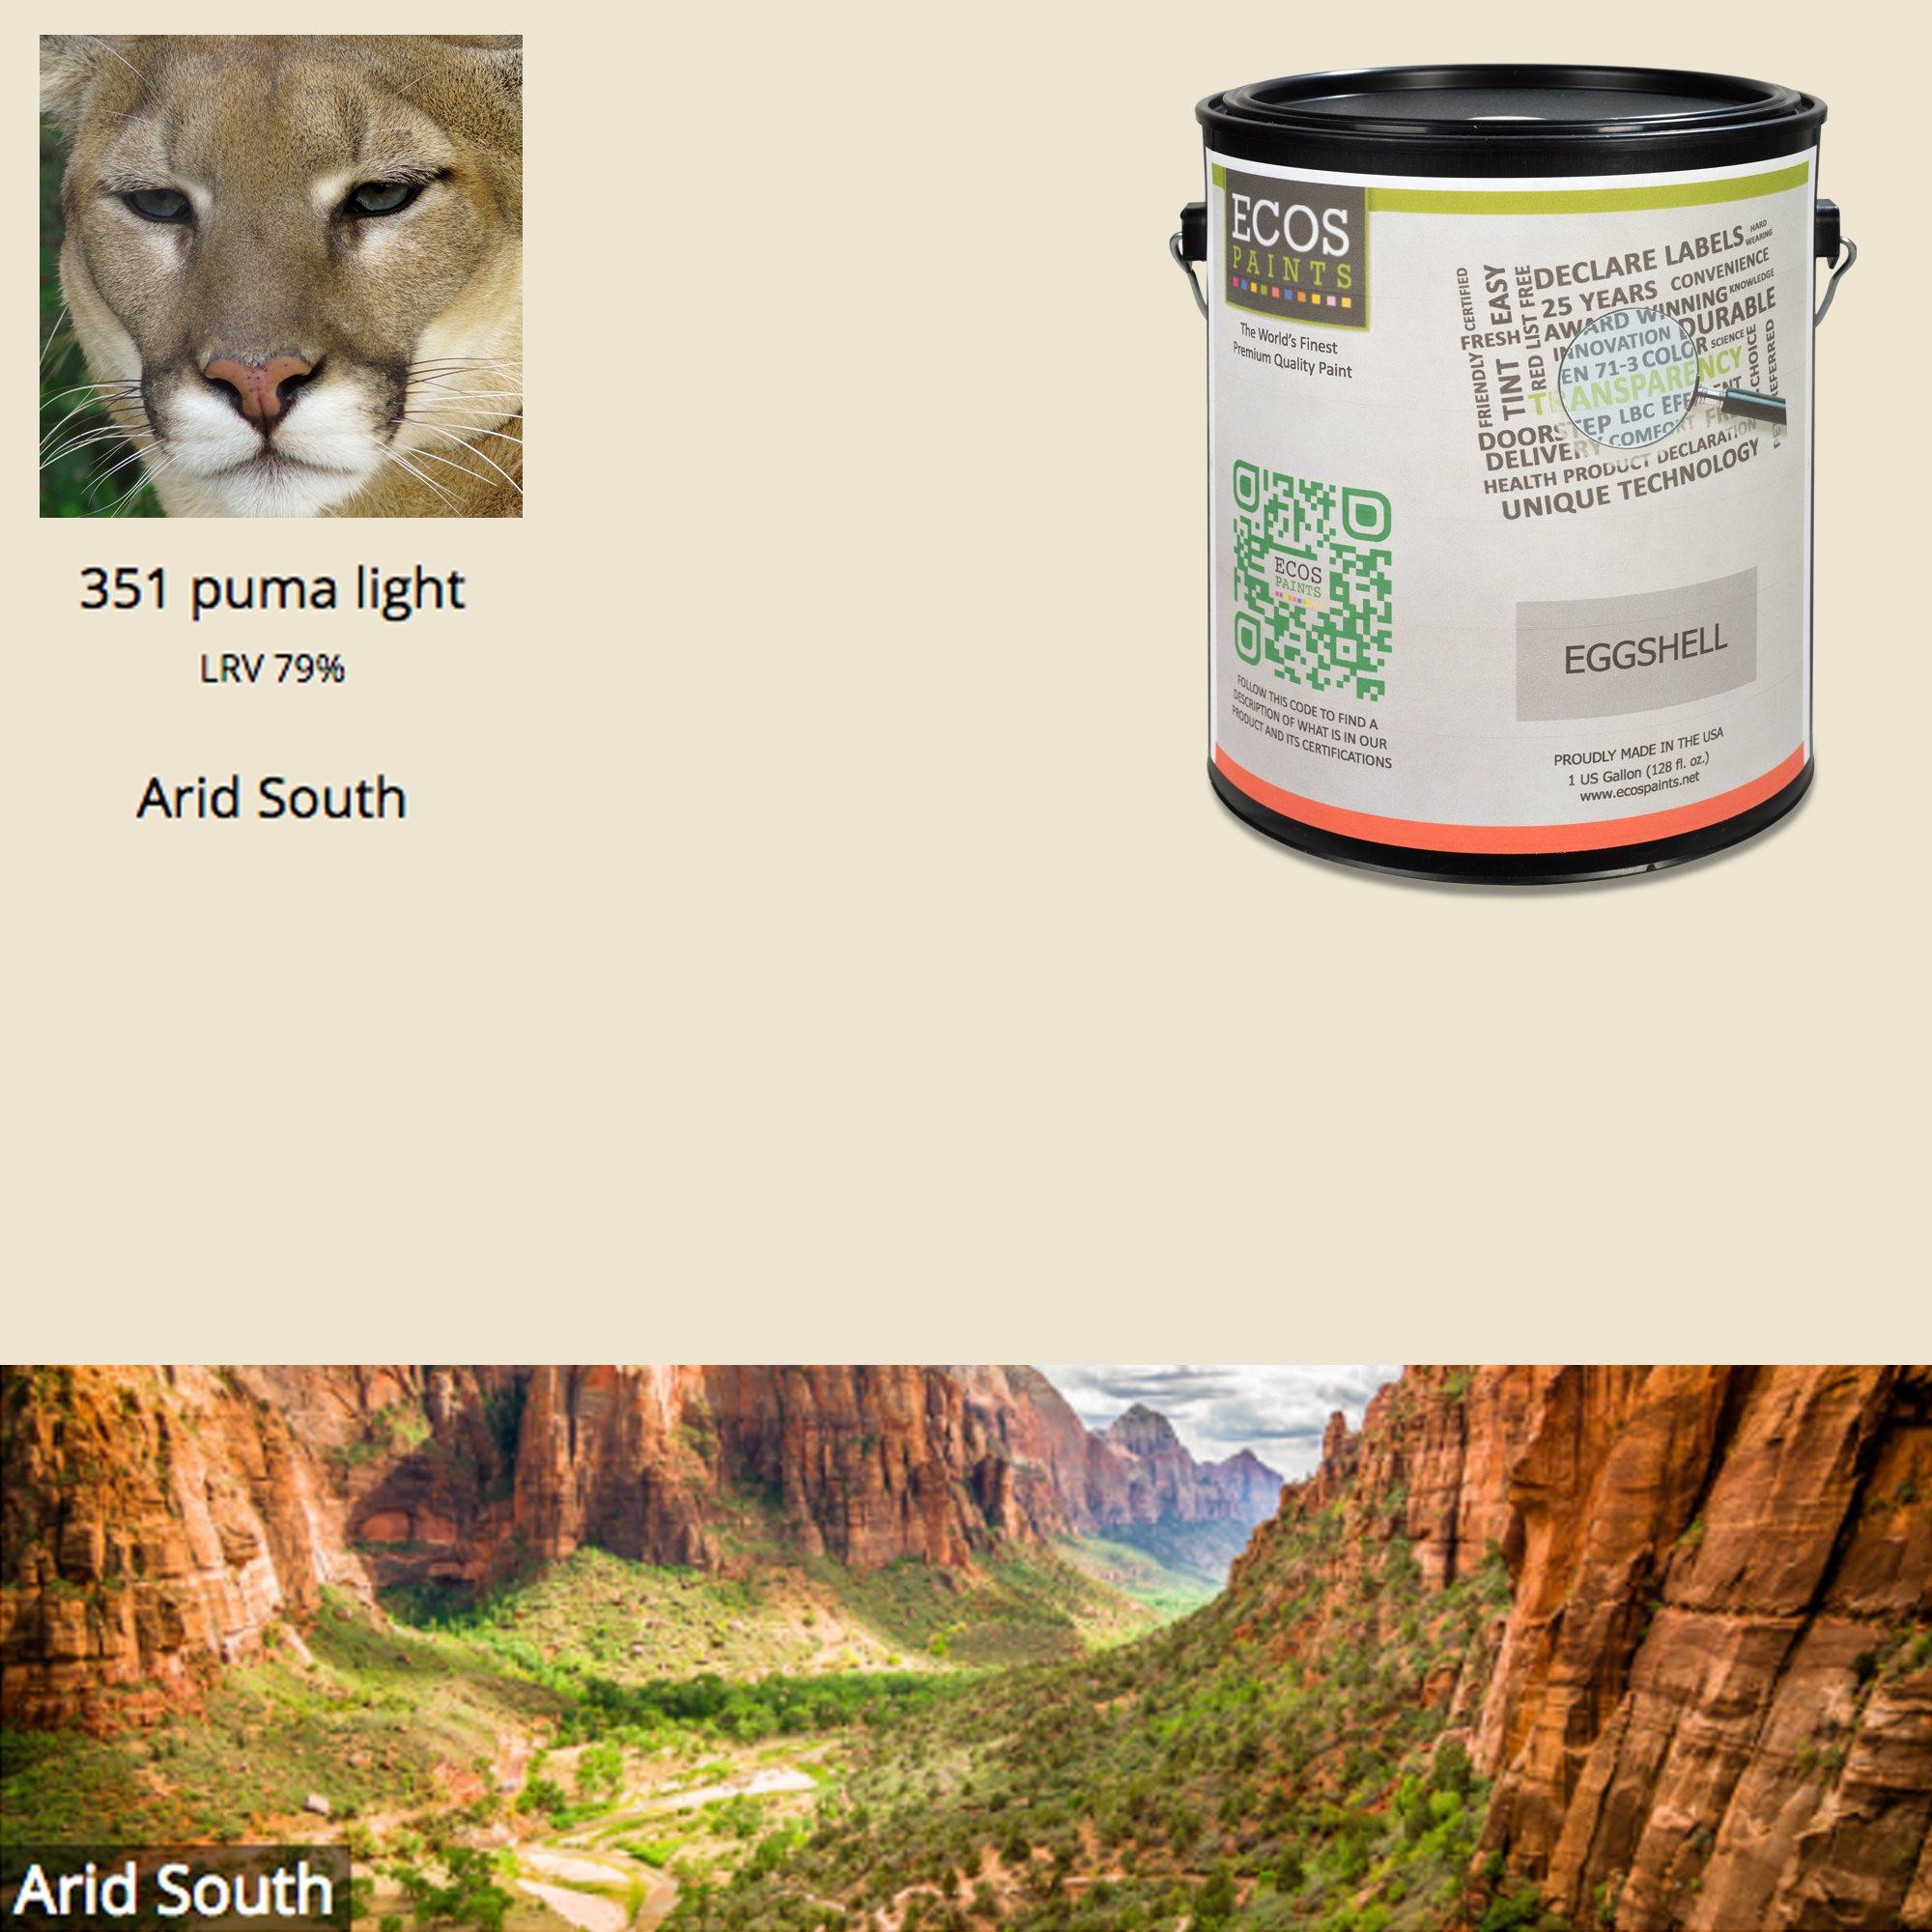 ECOS Paints 00817292025365 Interior Semi-Gloss Residential Paint, 1 quart, 351 Puma Light